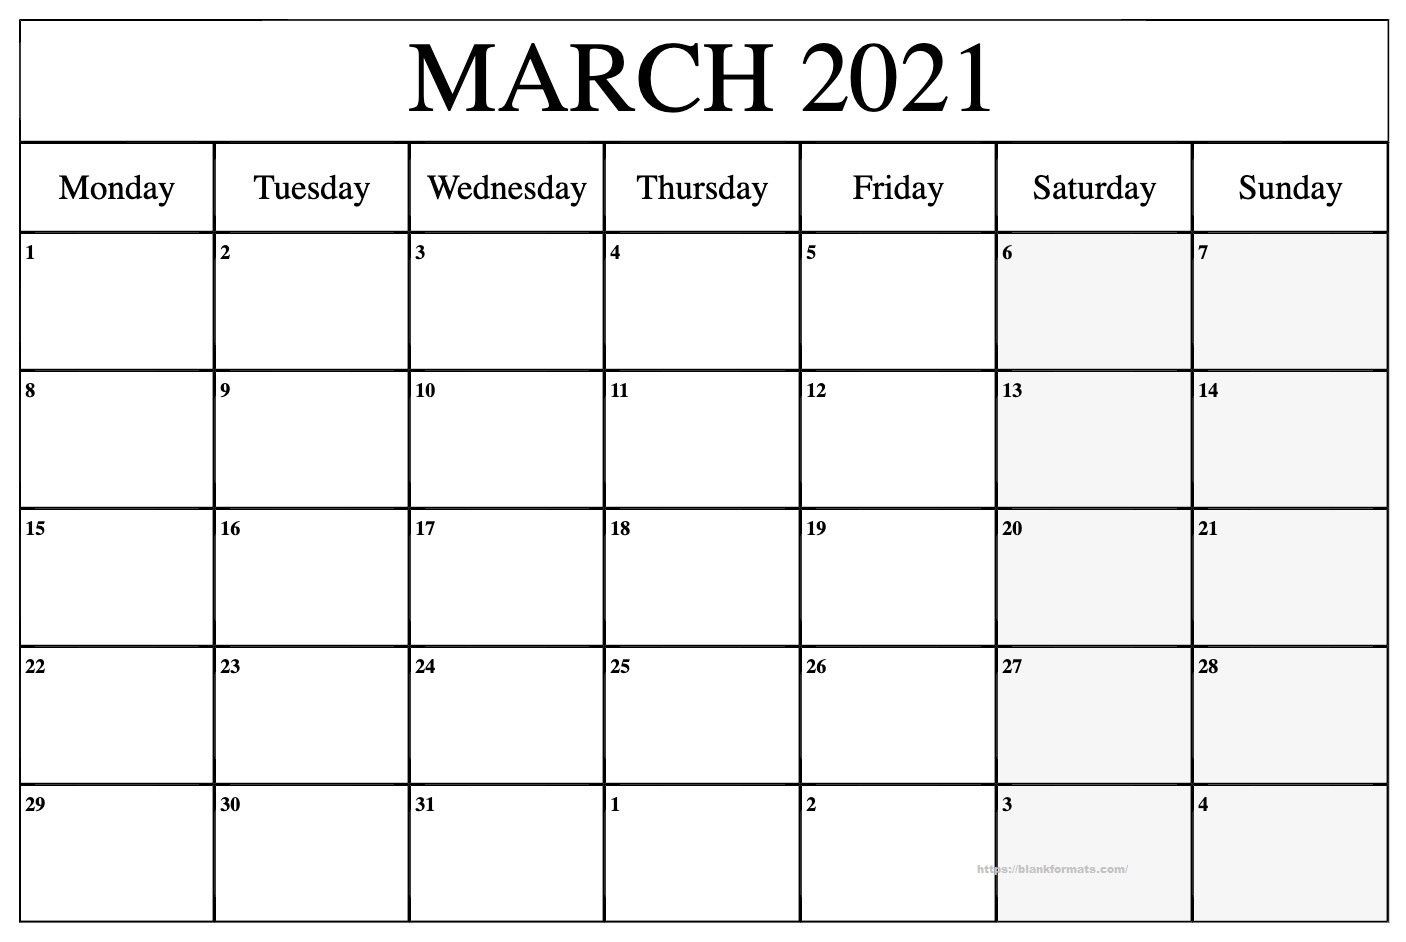 Printable March 2021 Calendar - Pdf, Word, Excel Sheet